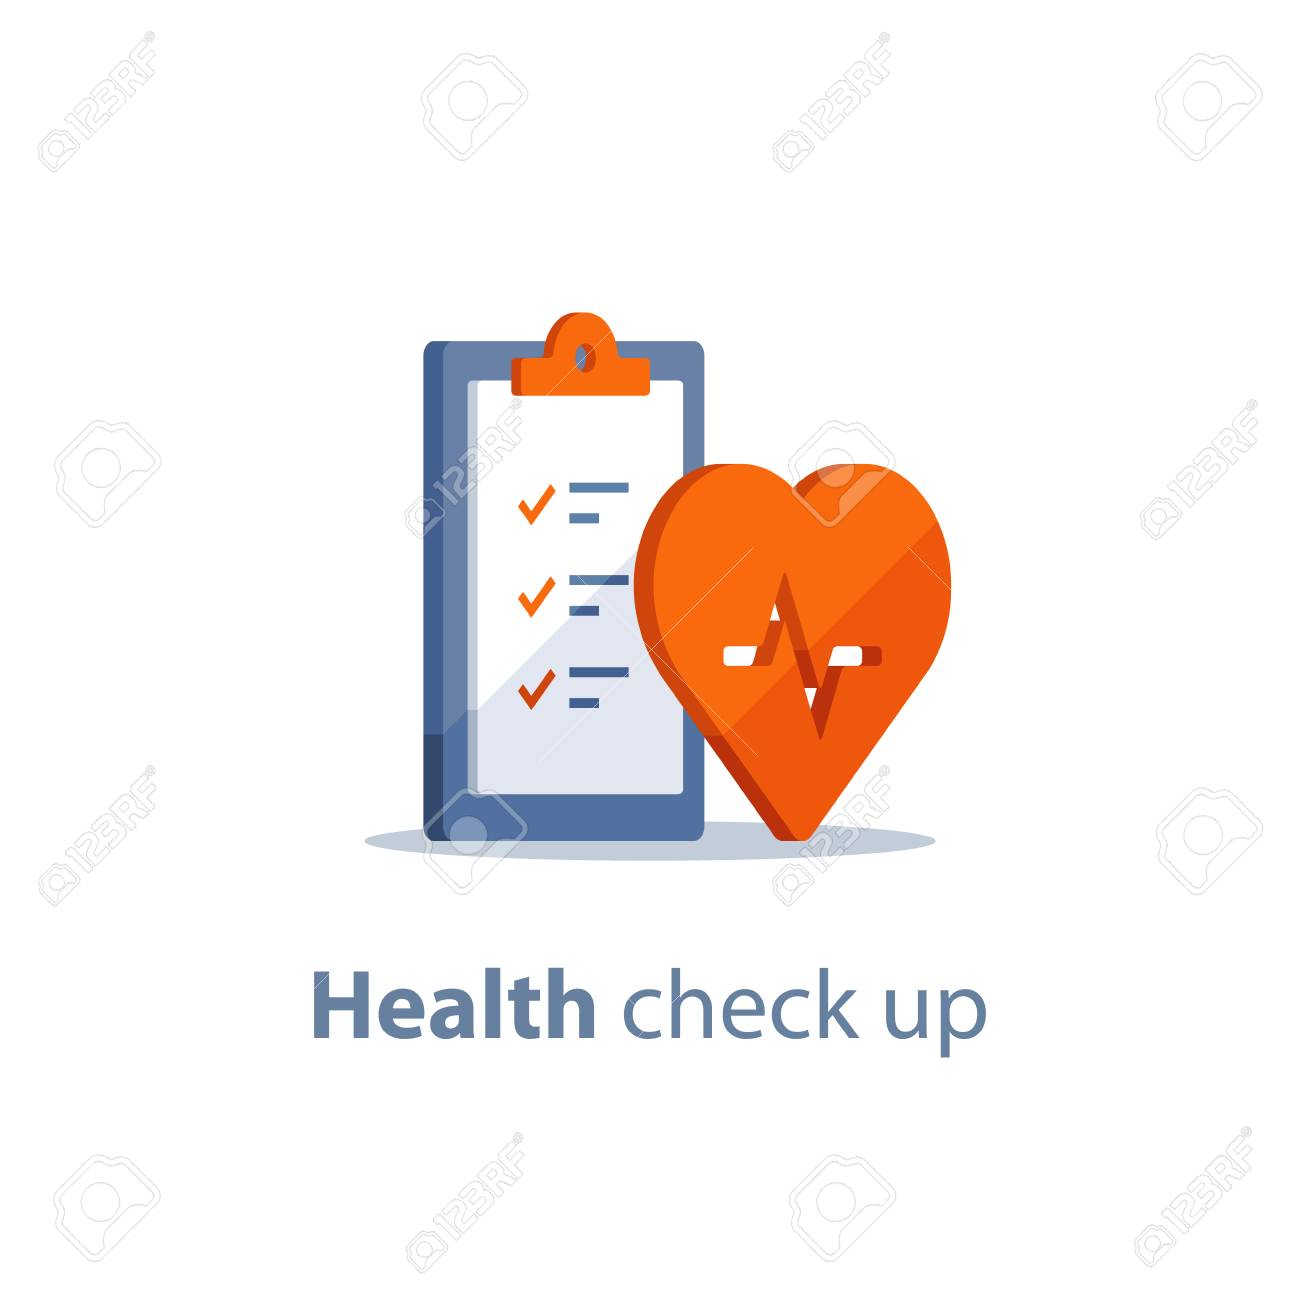 Health check up checklist, cardiovascular disease prevention